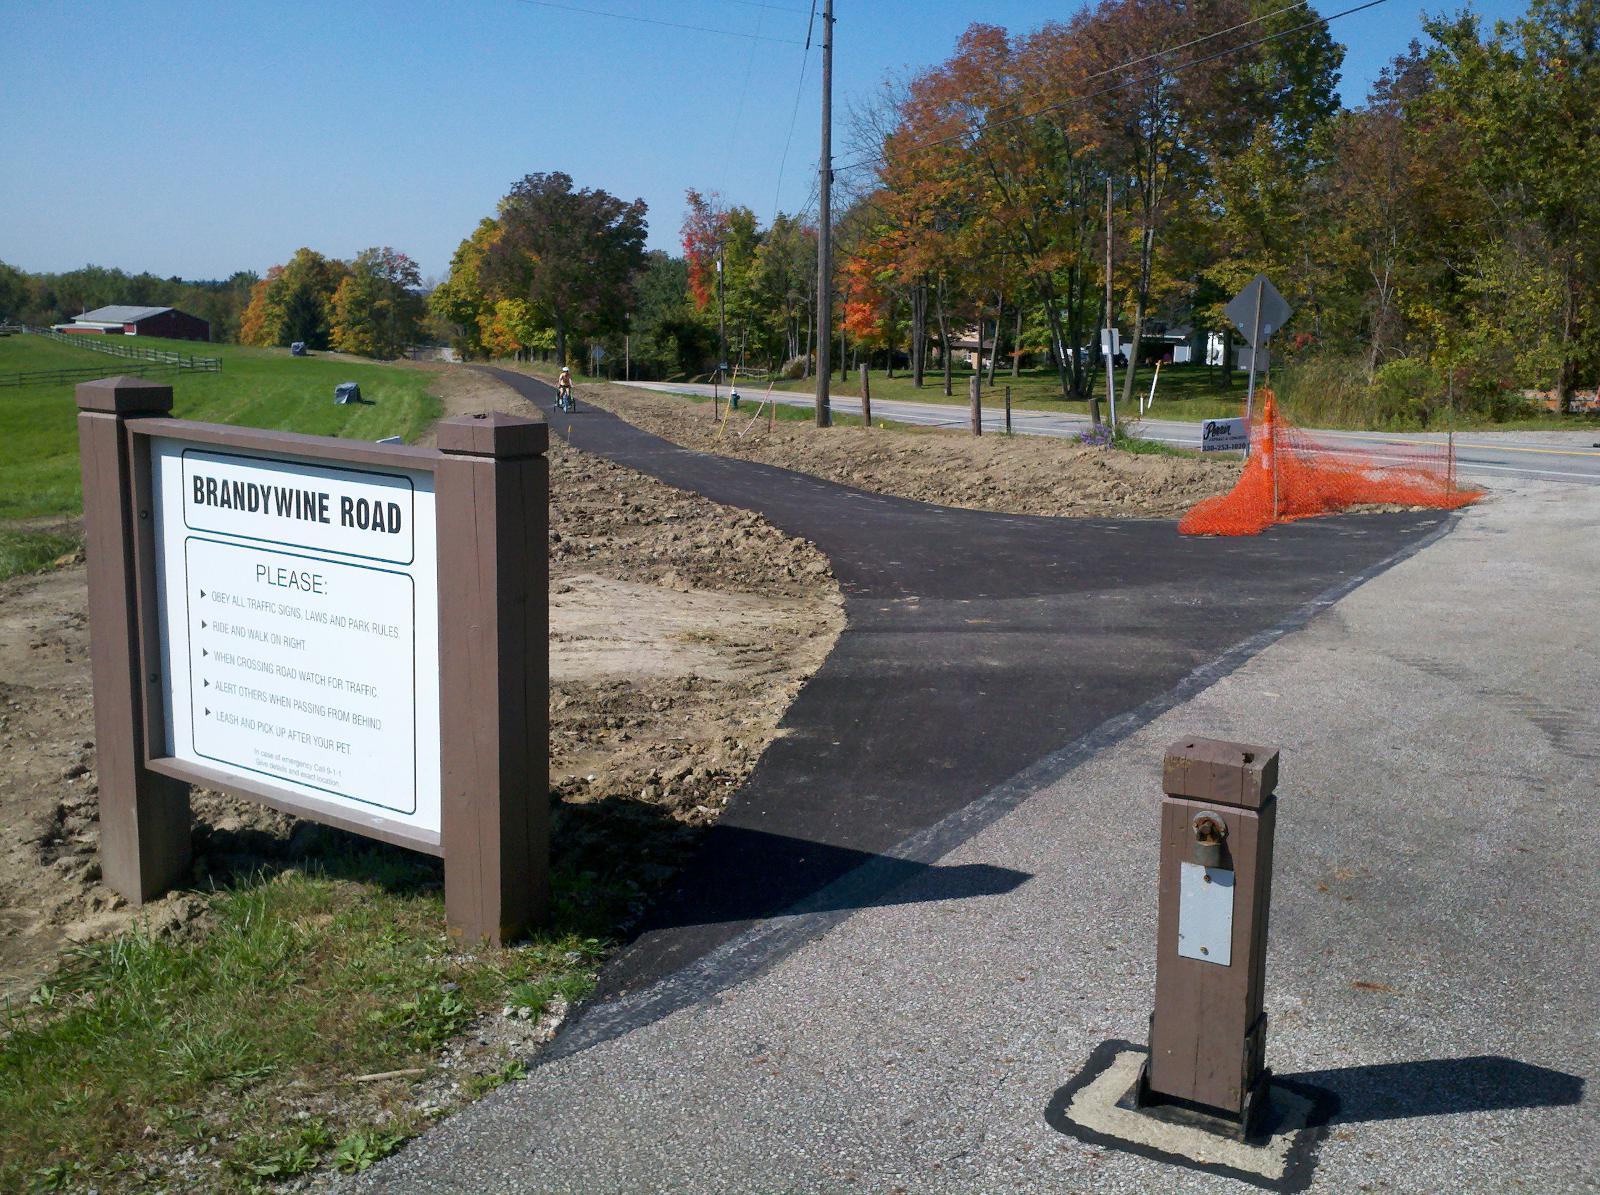 Progress On The Bike Hike Trail Brandywine Road Bypass Car Less Ohio